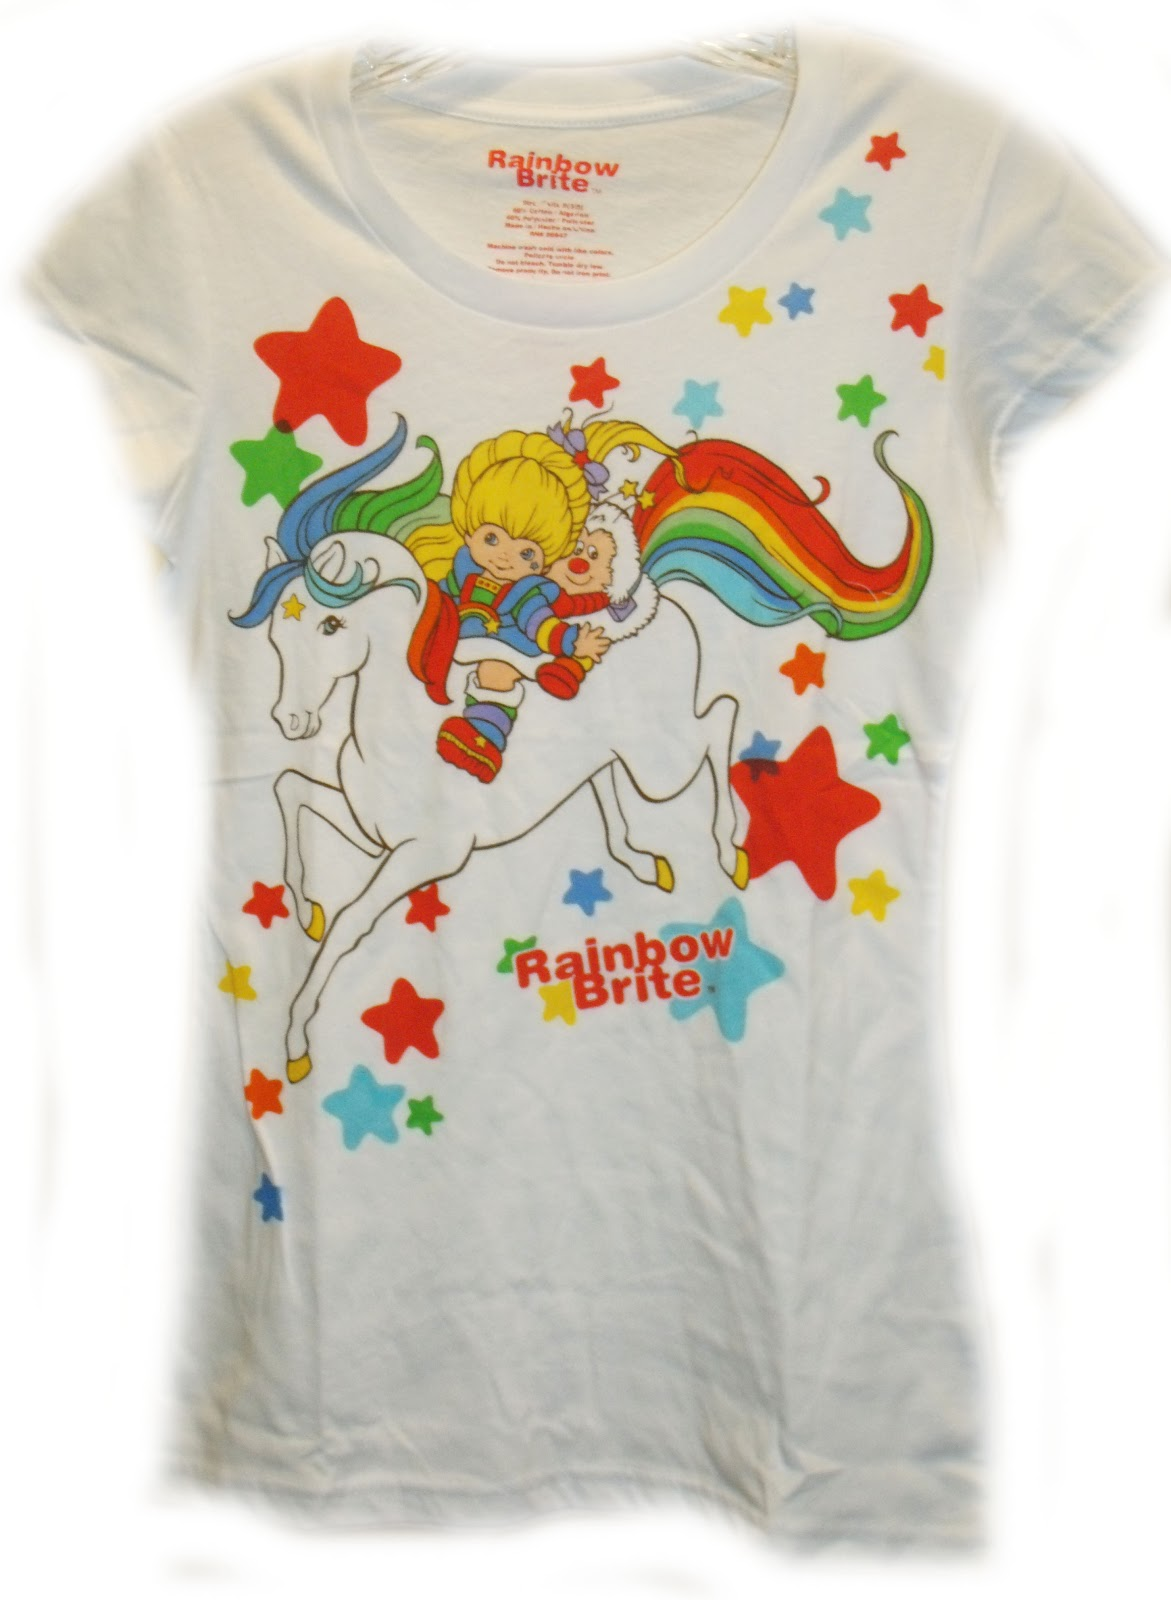 Walmart Ladies T Shirt Dresses